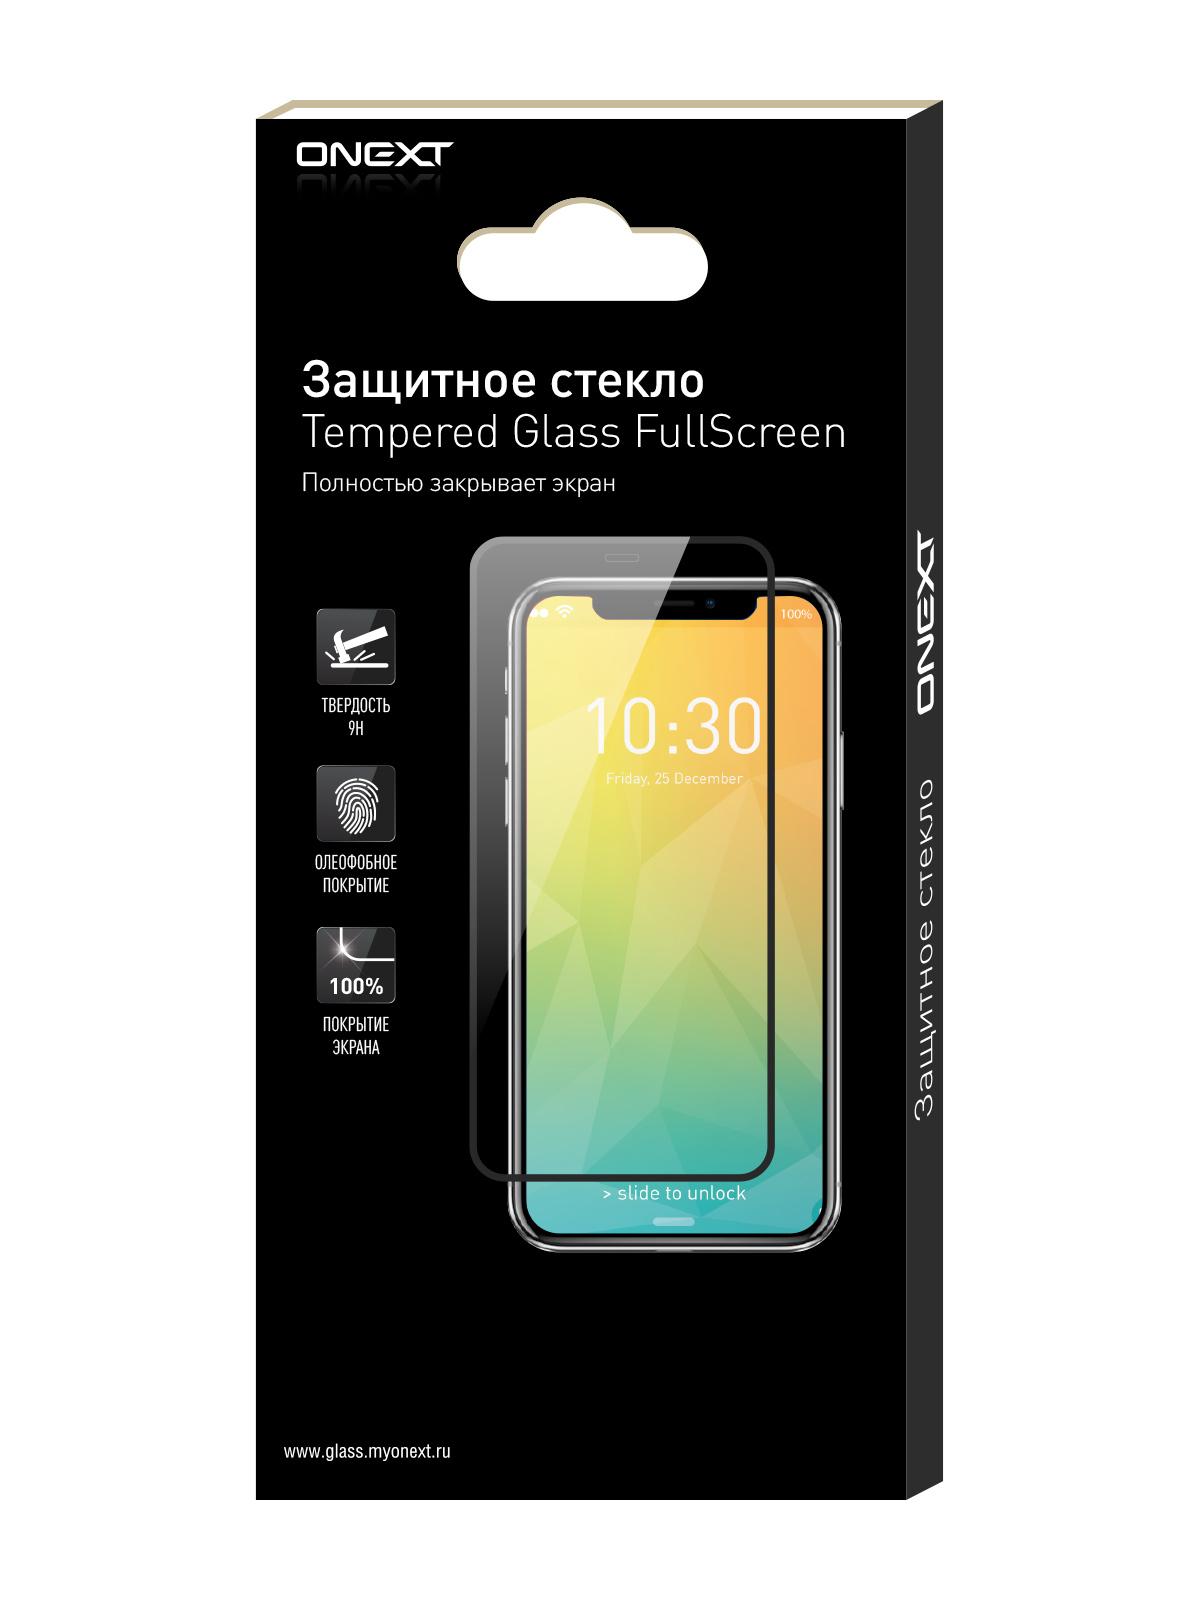 Защитное стекло ONEXT для Huawei P10 Lite Black